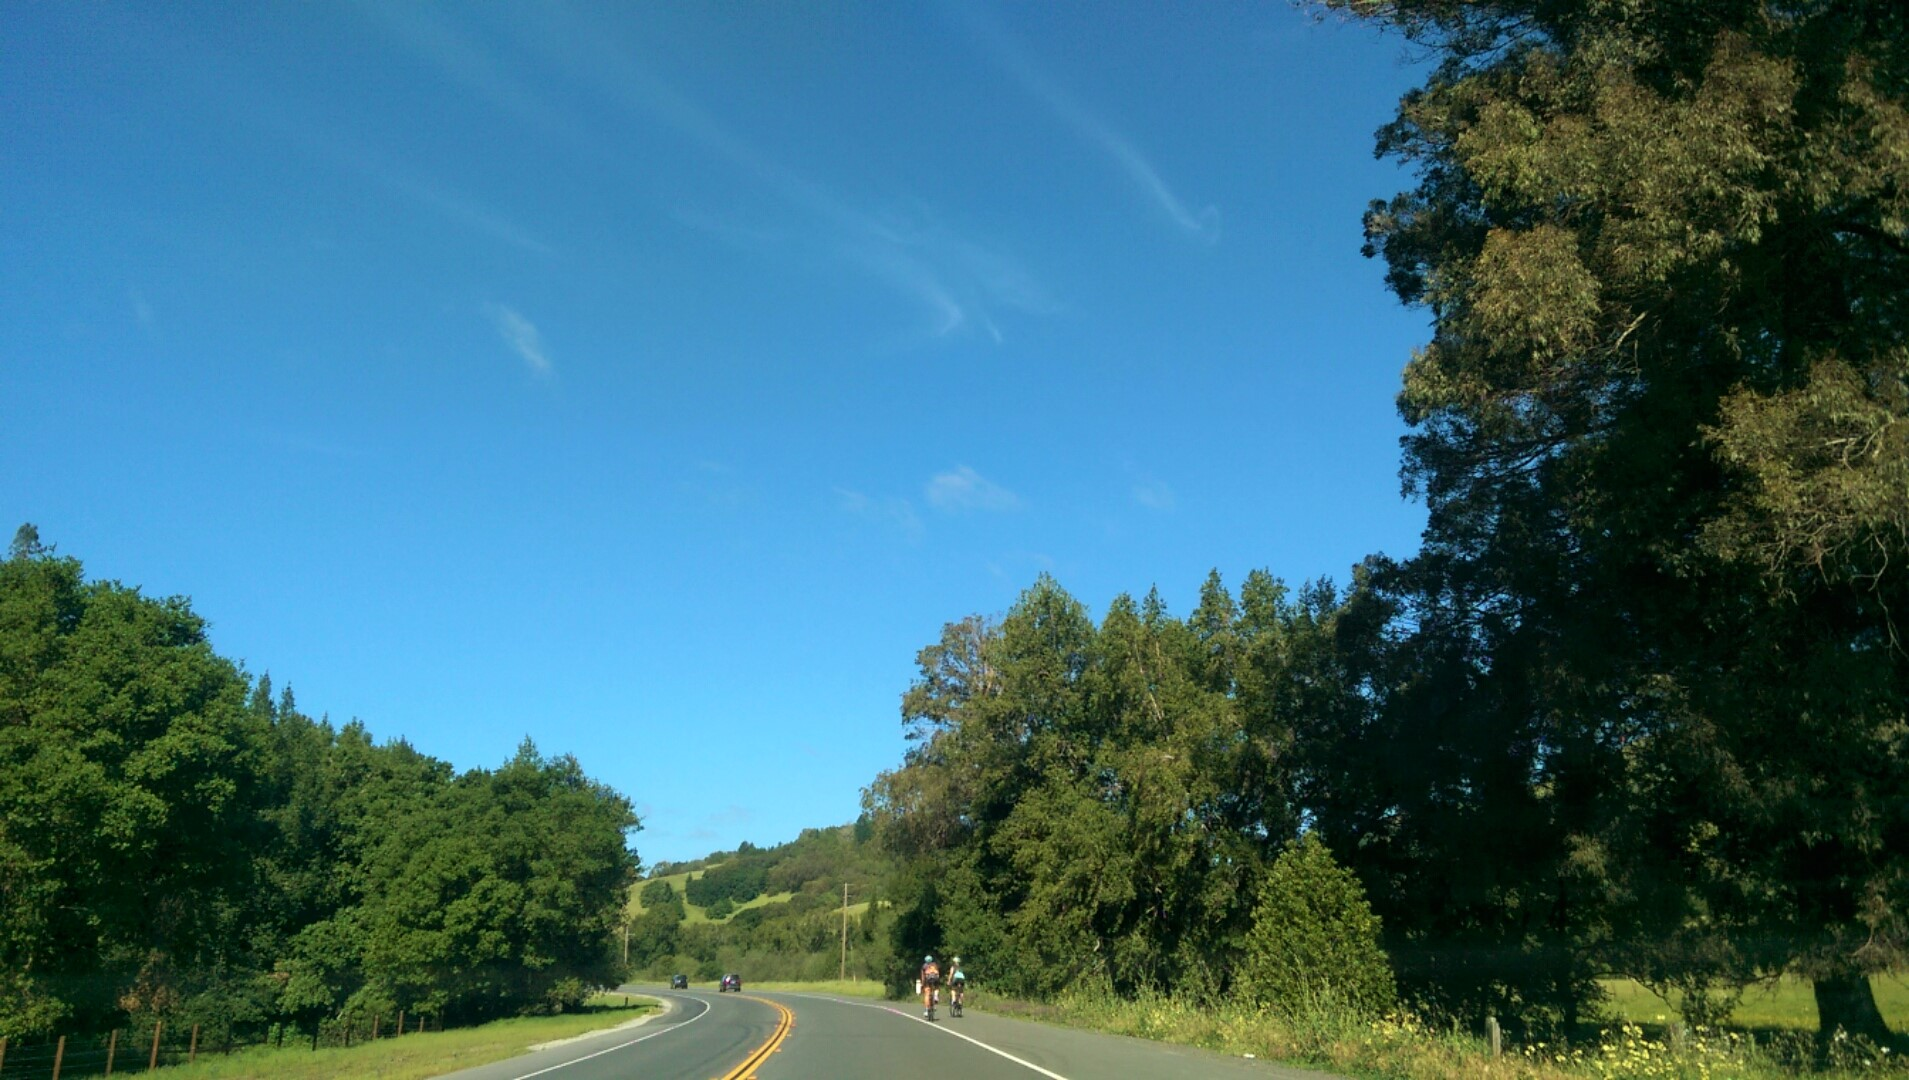 Bikers in Fairfax, California